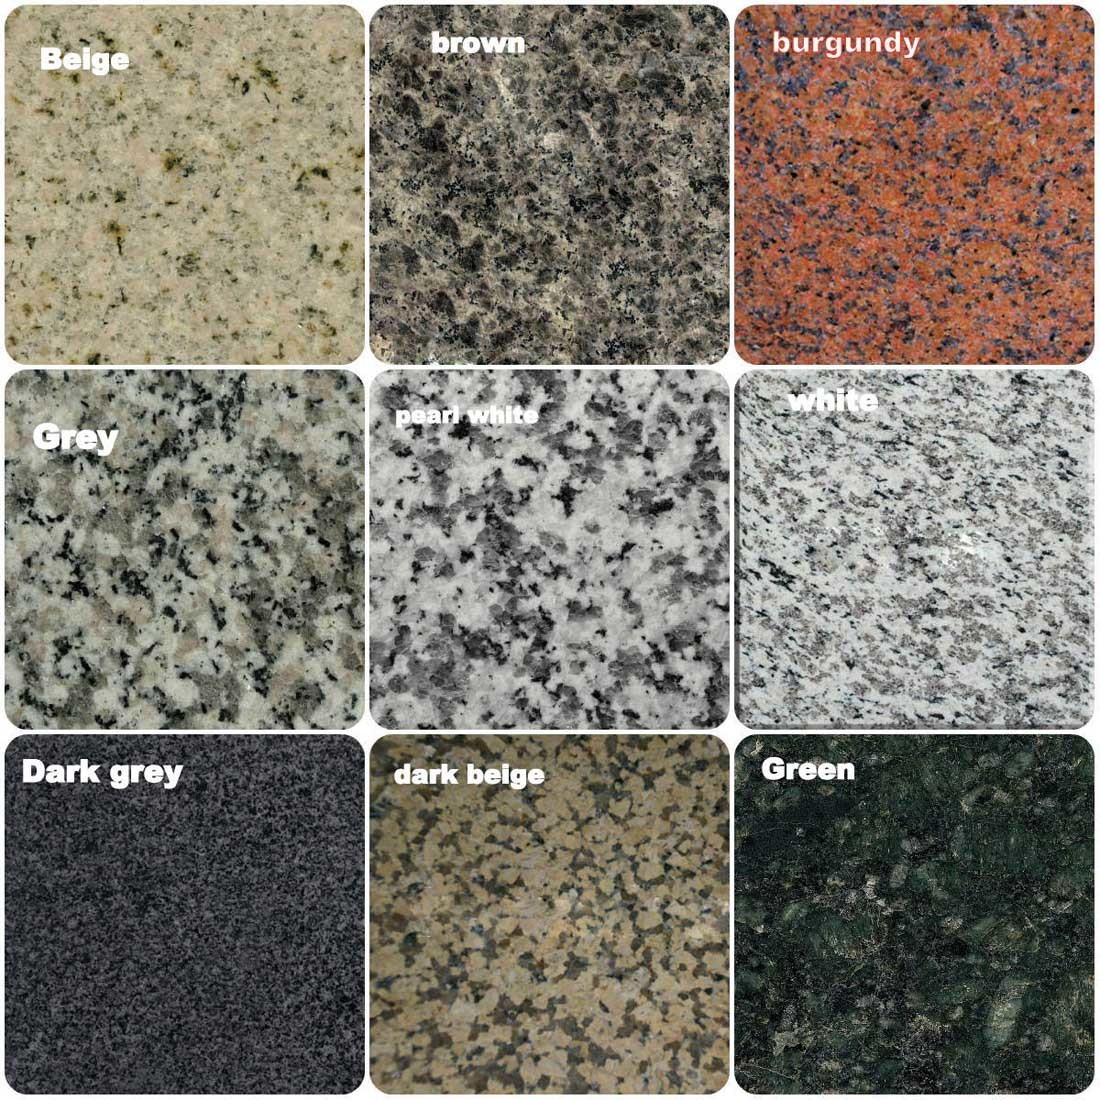 G681/G684/G365/G682/G603/G654/G640/G687/Biancosardo/Cristal White/Grey/Red/Yellow/Brown/Beige/Green/Black China Cheap Granite for Flooring/Pavement/Tile/Steps